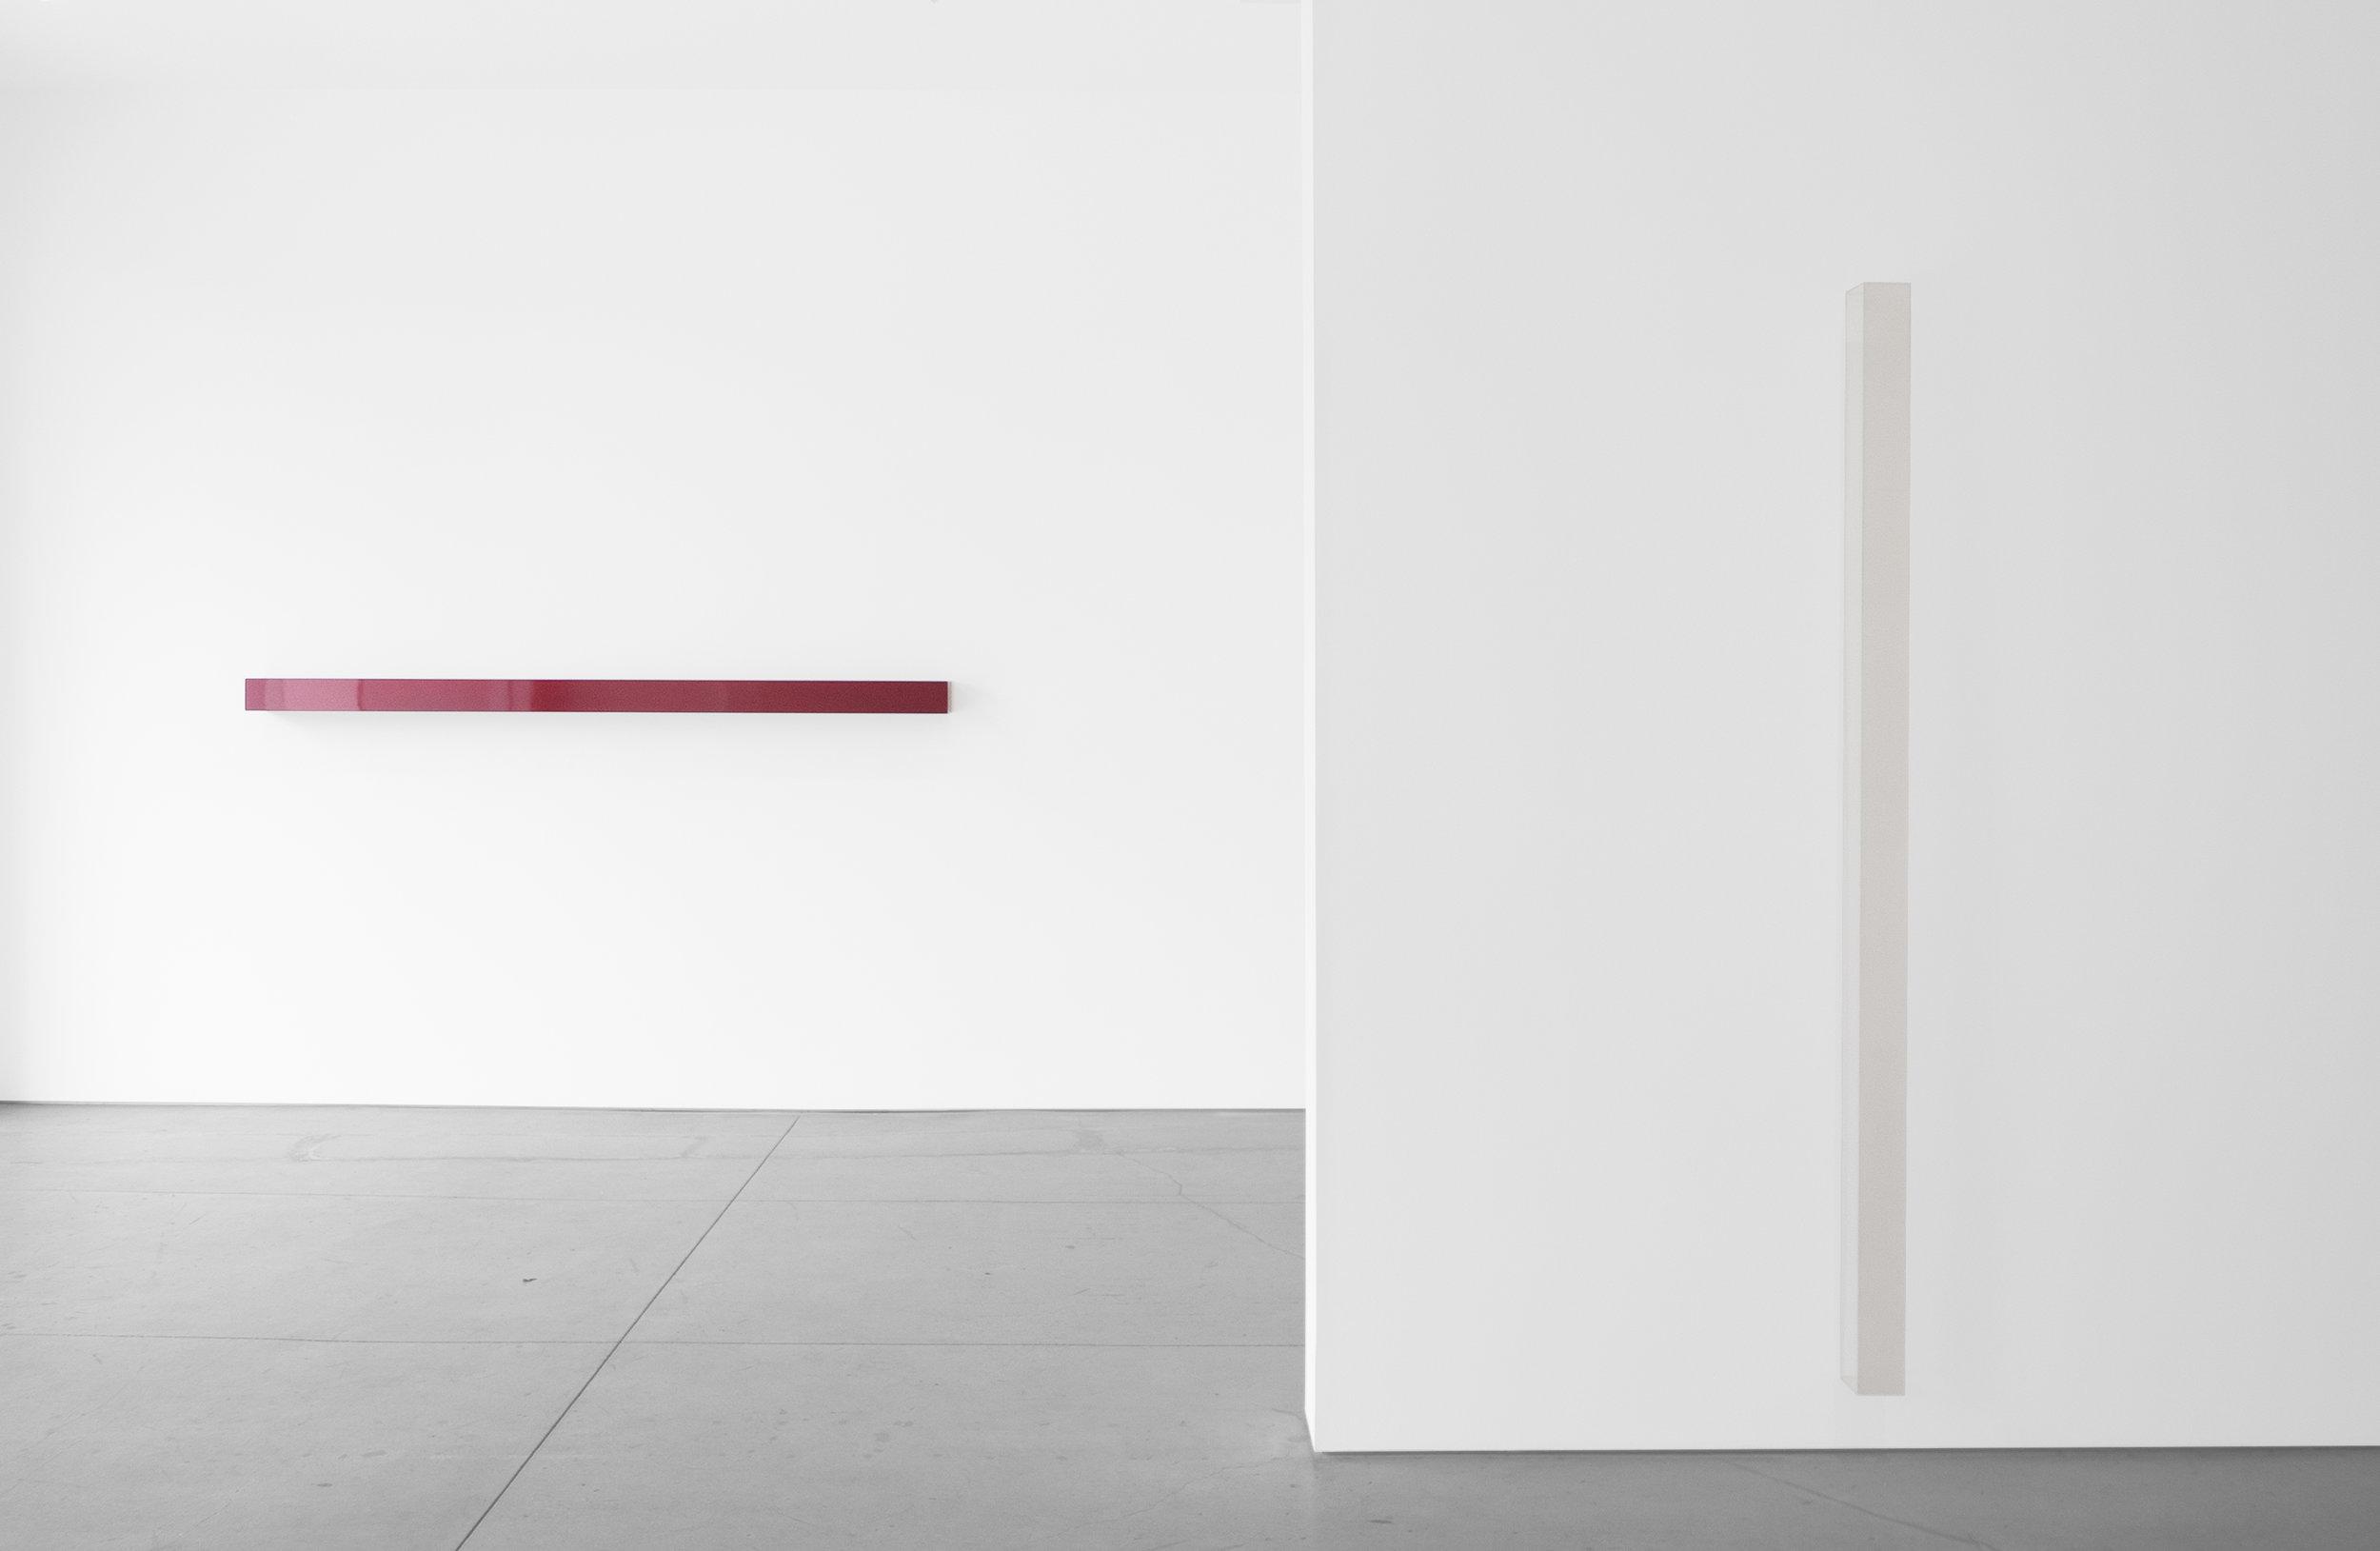 25 Years_Peter Blake Gallery_2019_Installation View_8.jpg